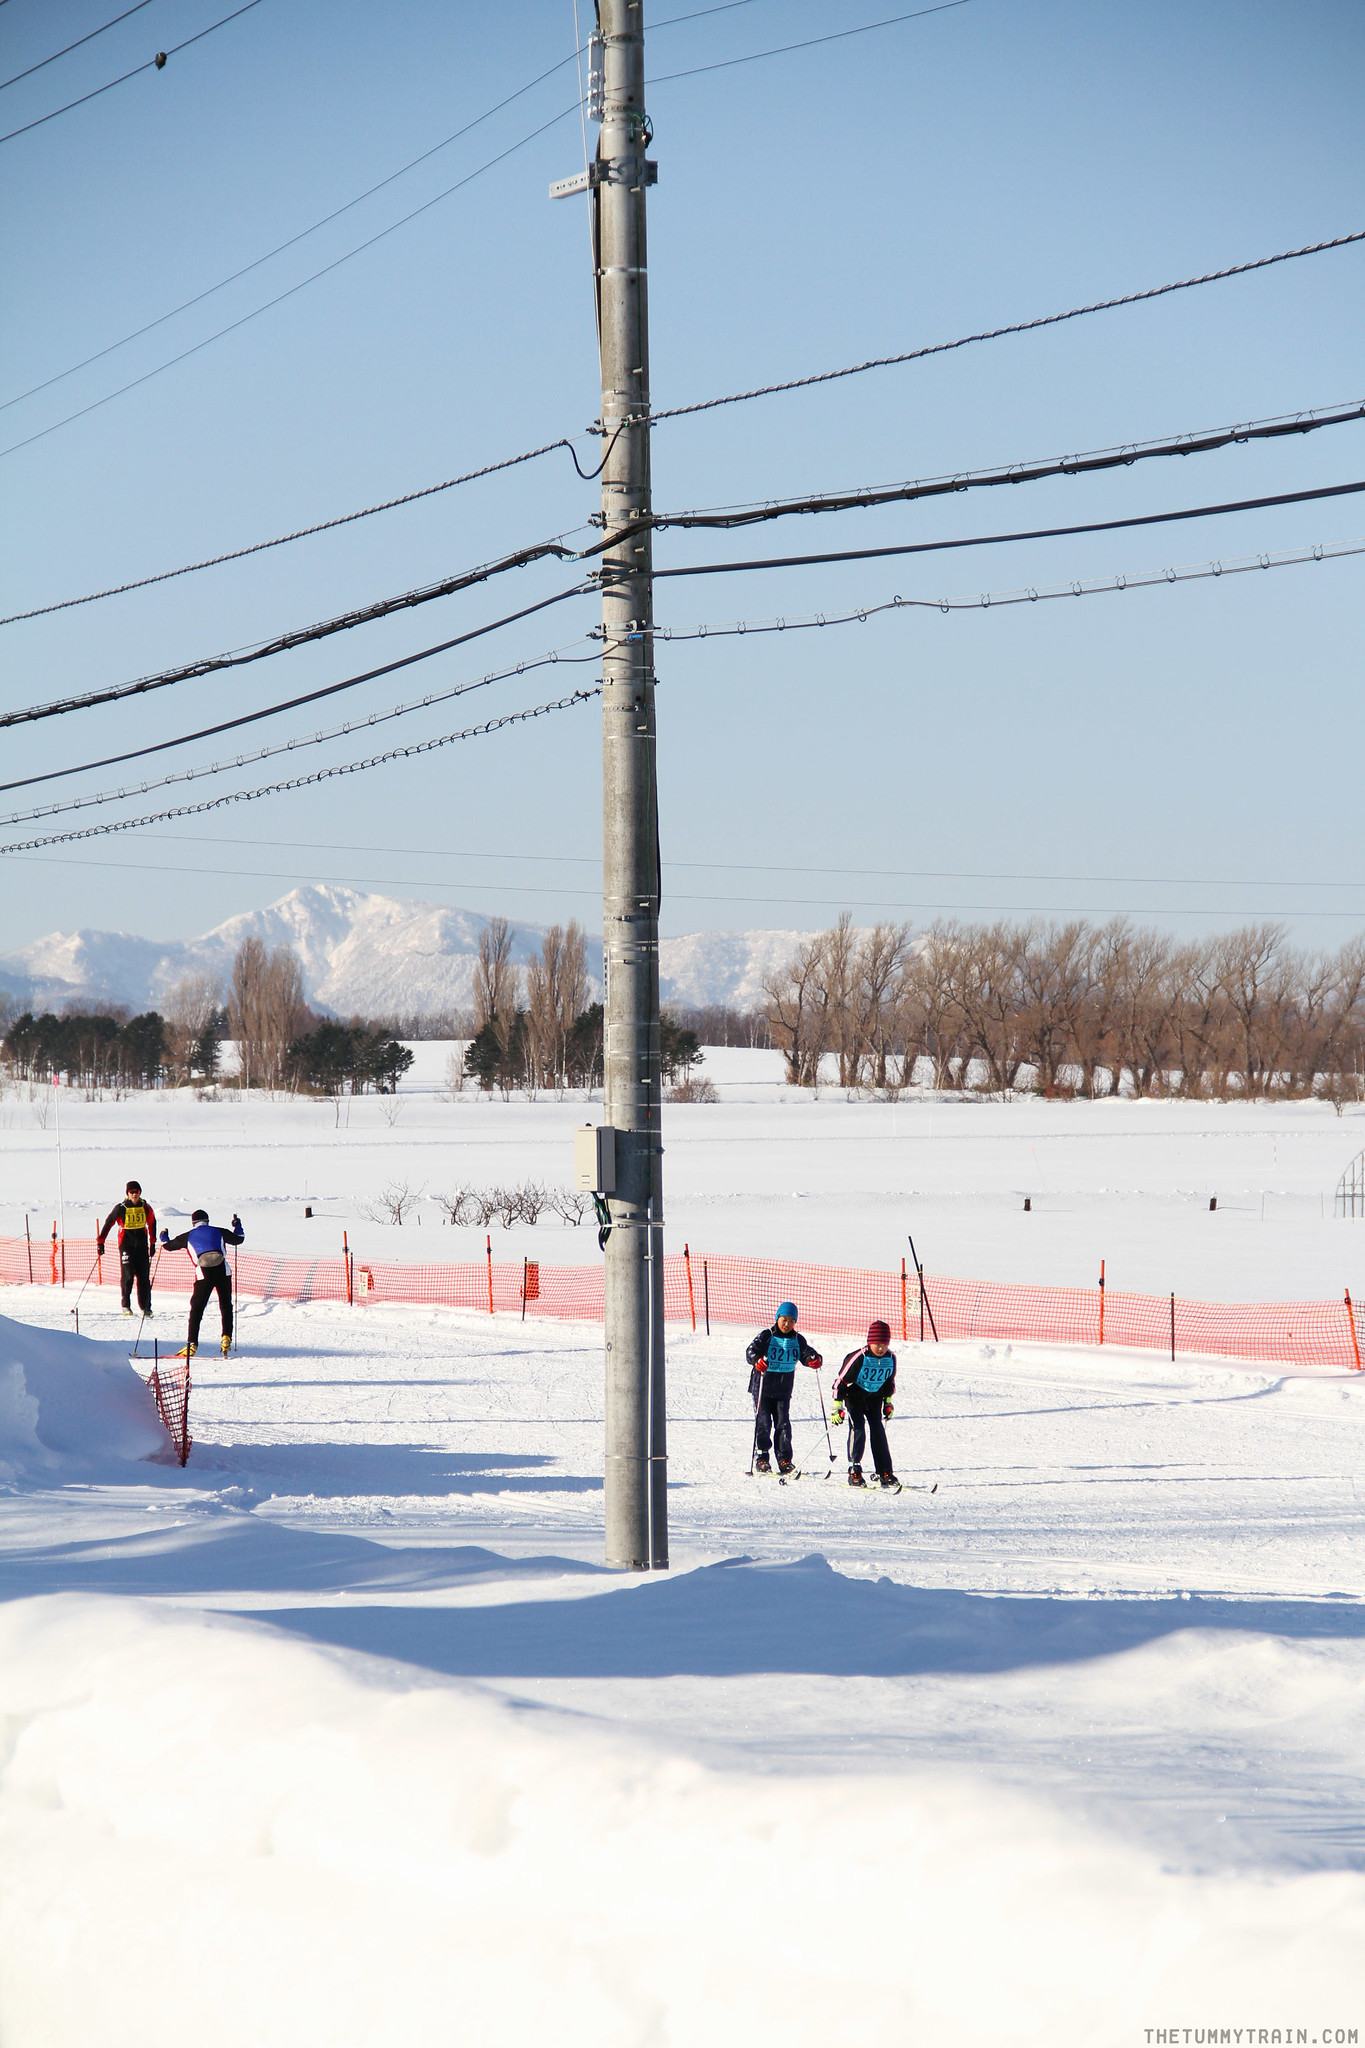 32876463396 6dfe32c779 k - Sapporo Snow And Smile: 8 Unforgettable Winter Experiences in Sapporo City